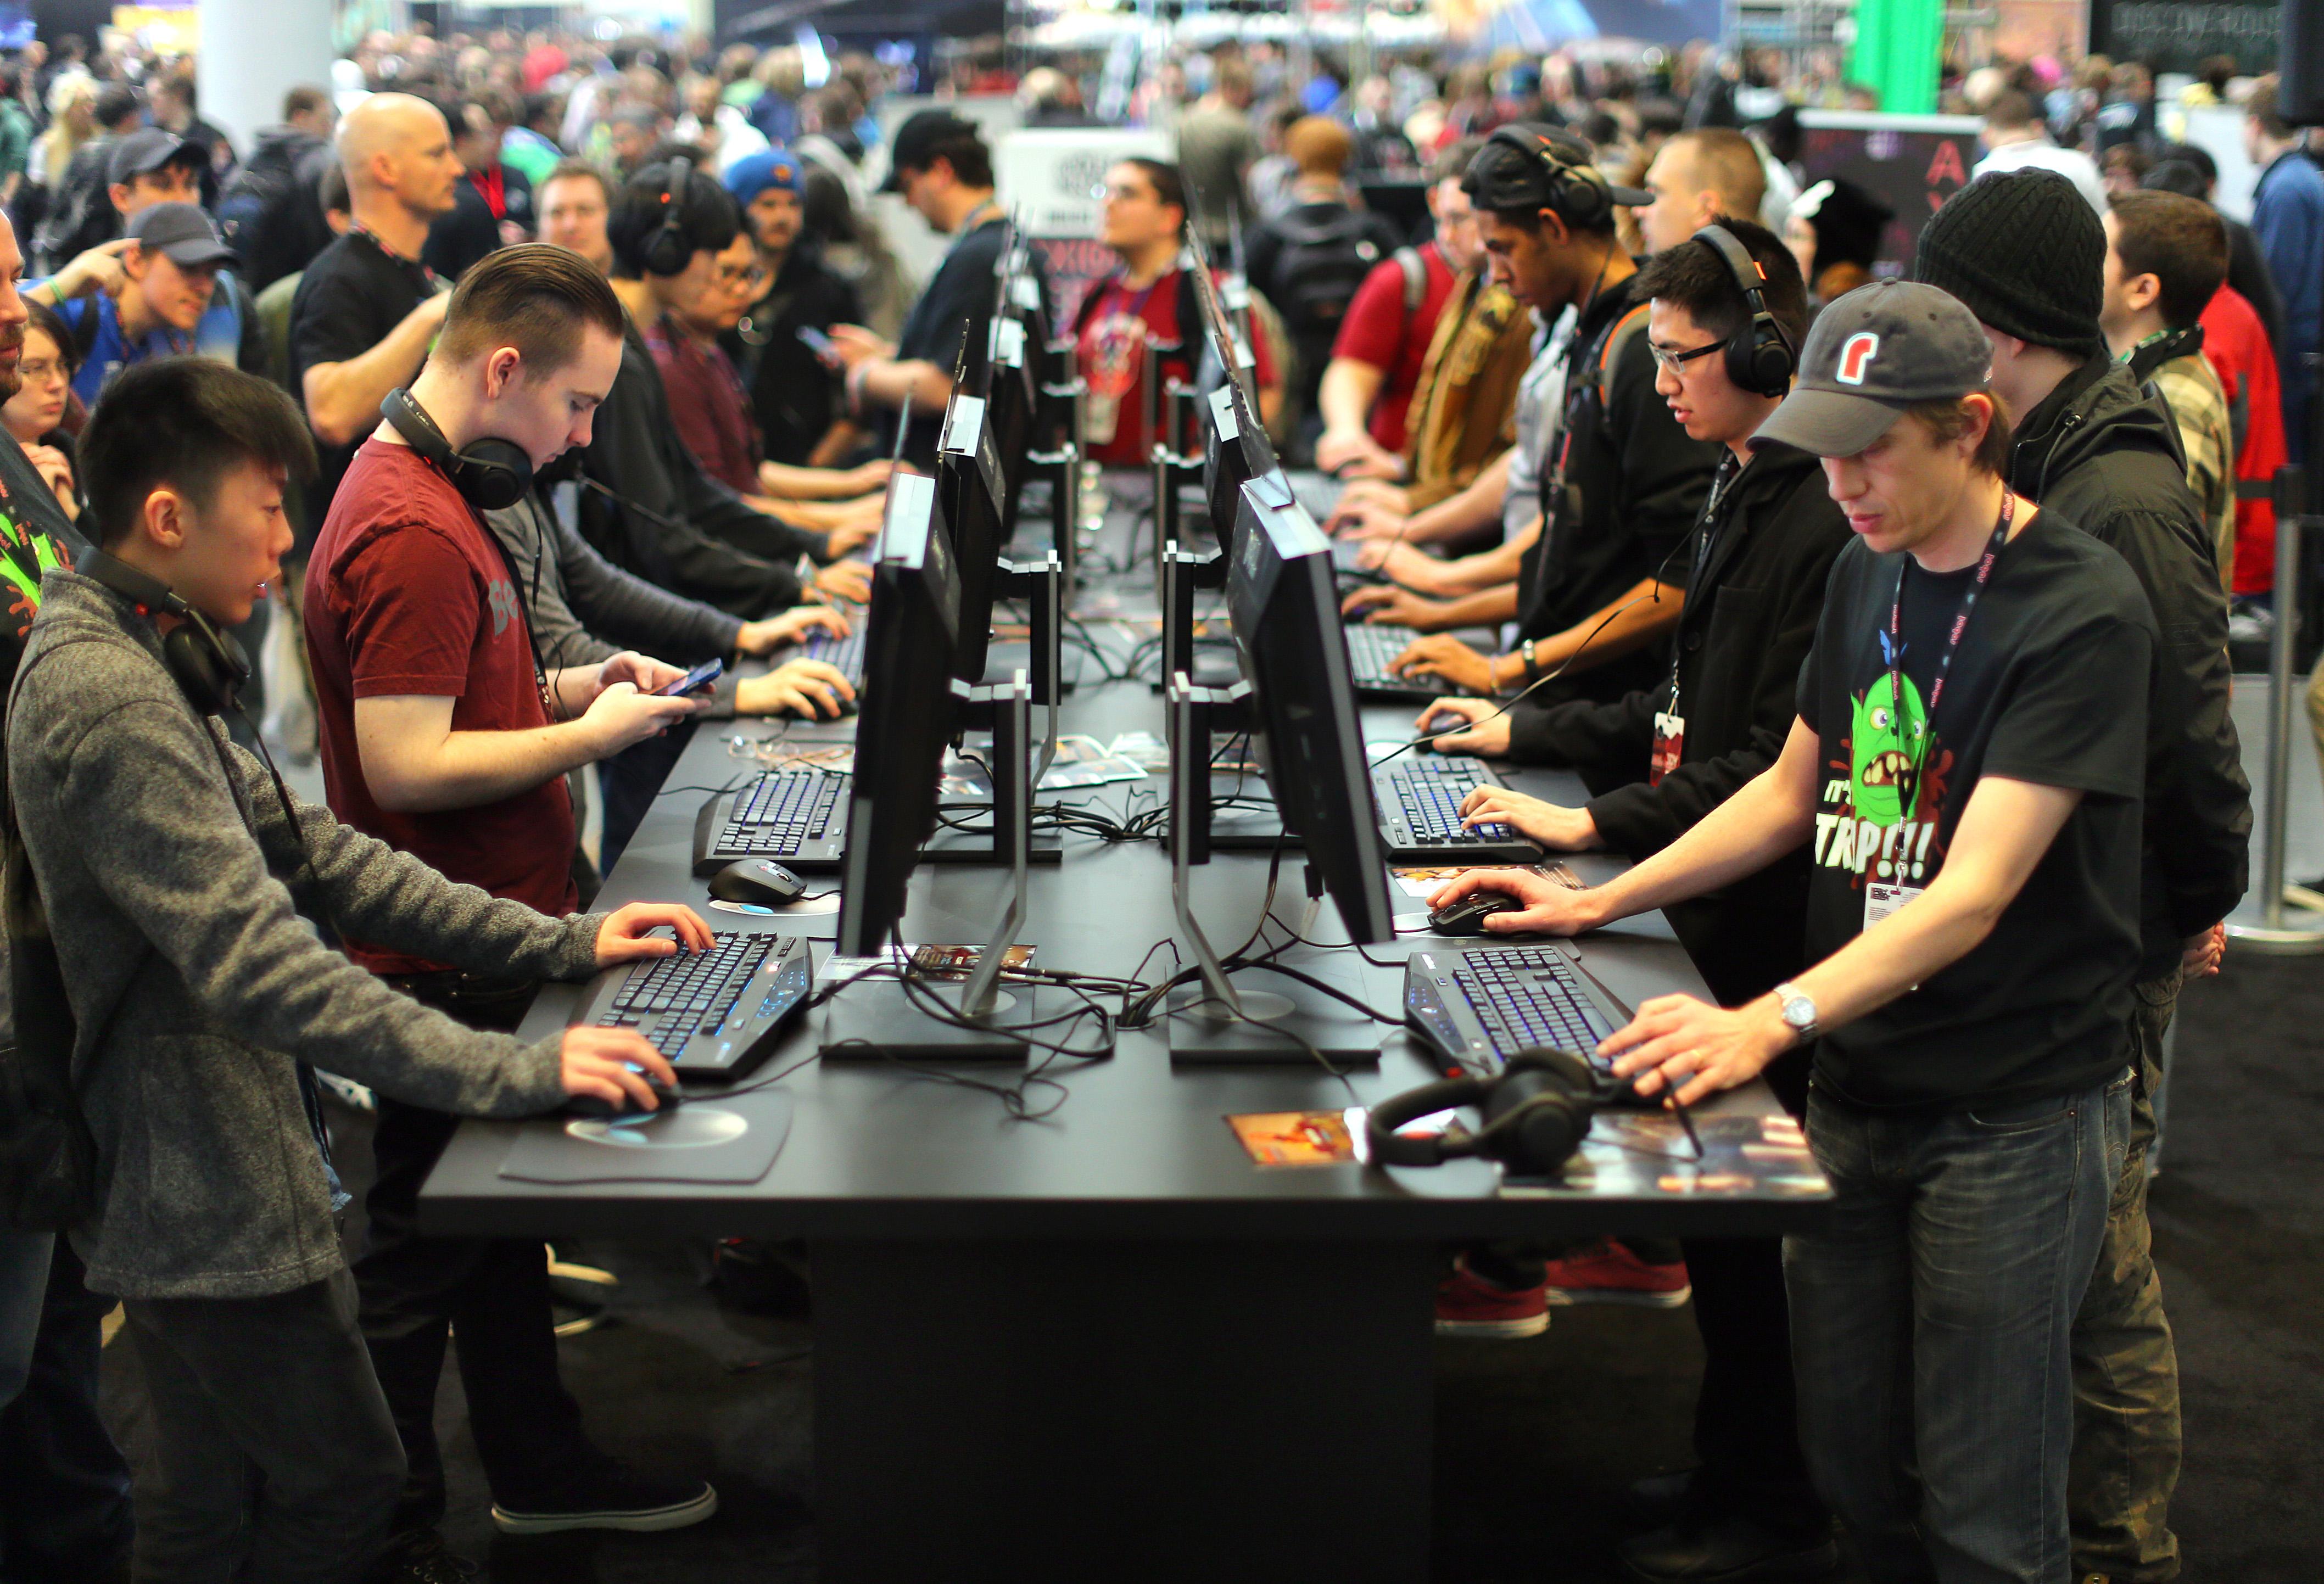 Video gaming's Final Four hits Boston - The Boston Globe